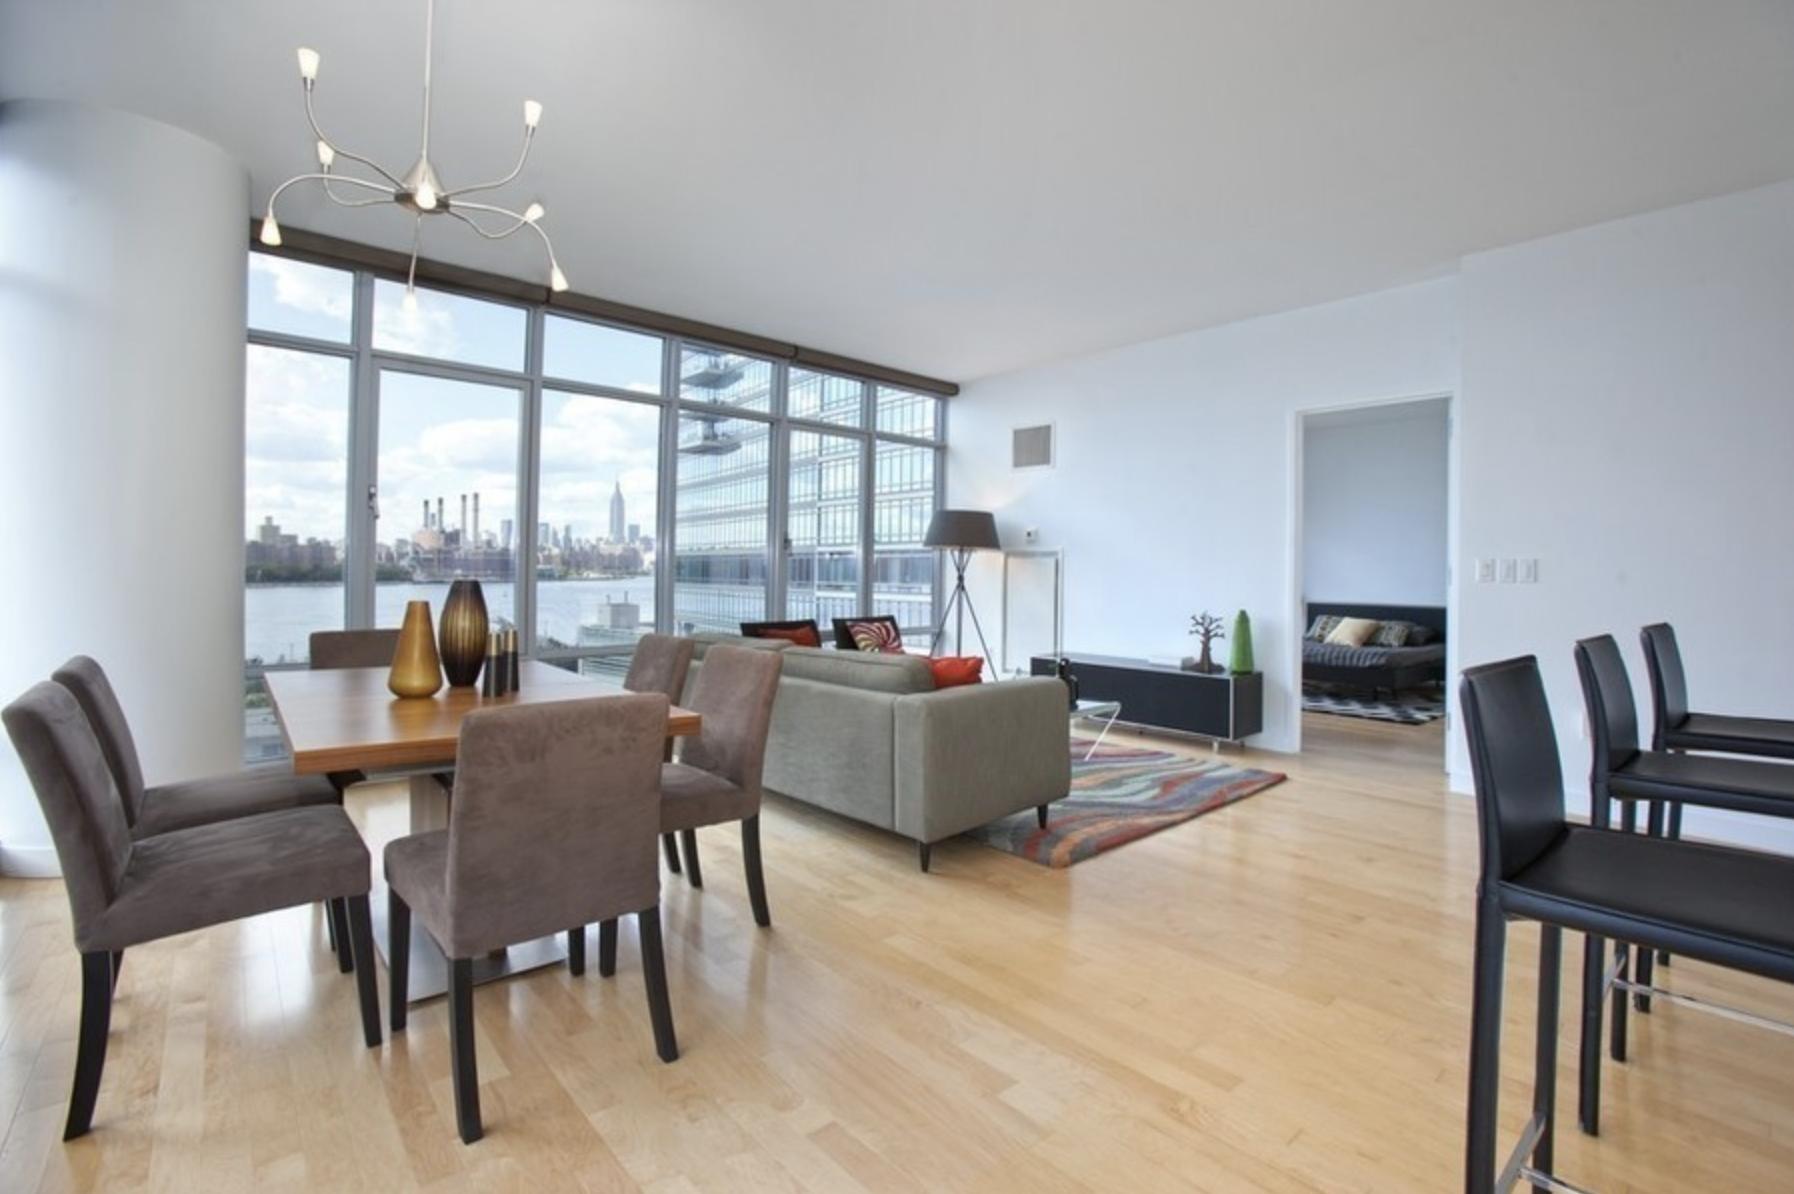 1 Northside Piers, #5D - Williamsburg | Brooklyn    2 Bedroom // 2 Bath Days on Market — 15 Sold Price:    $950,000